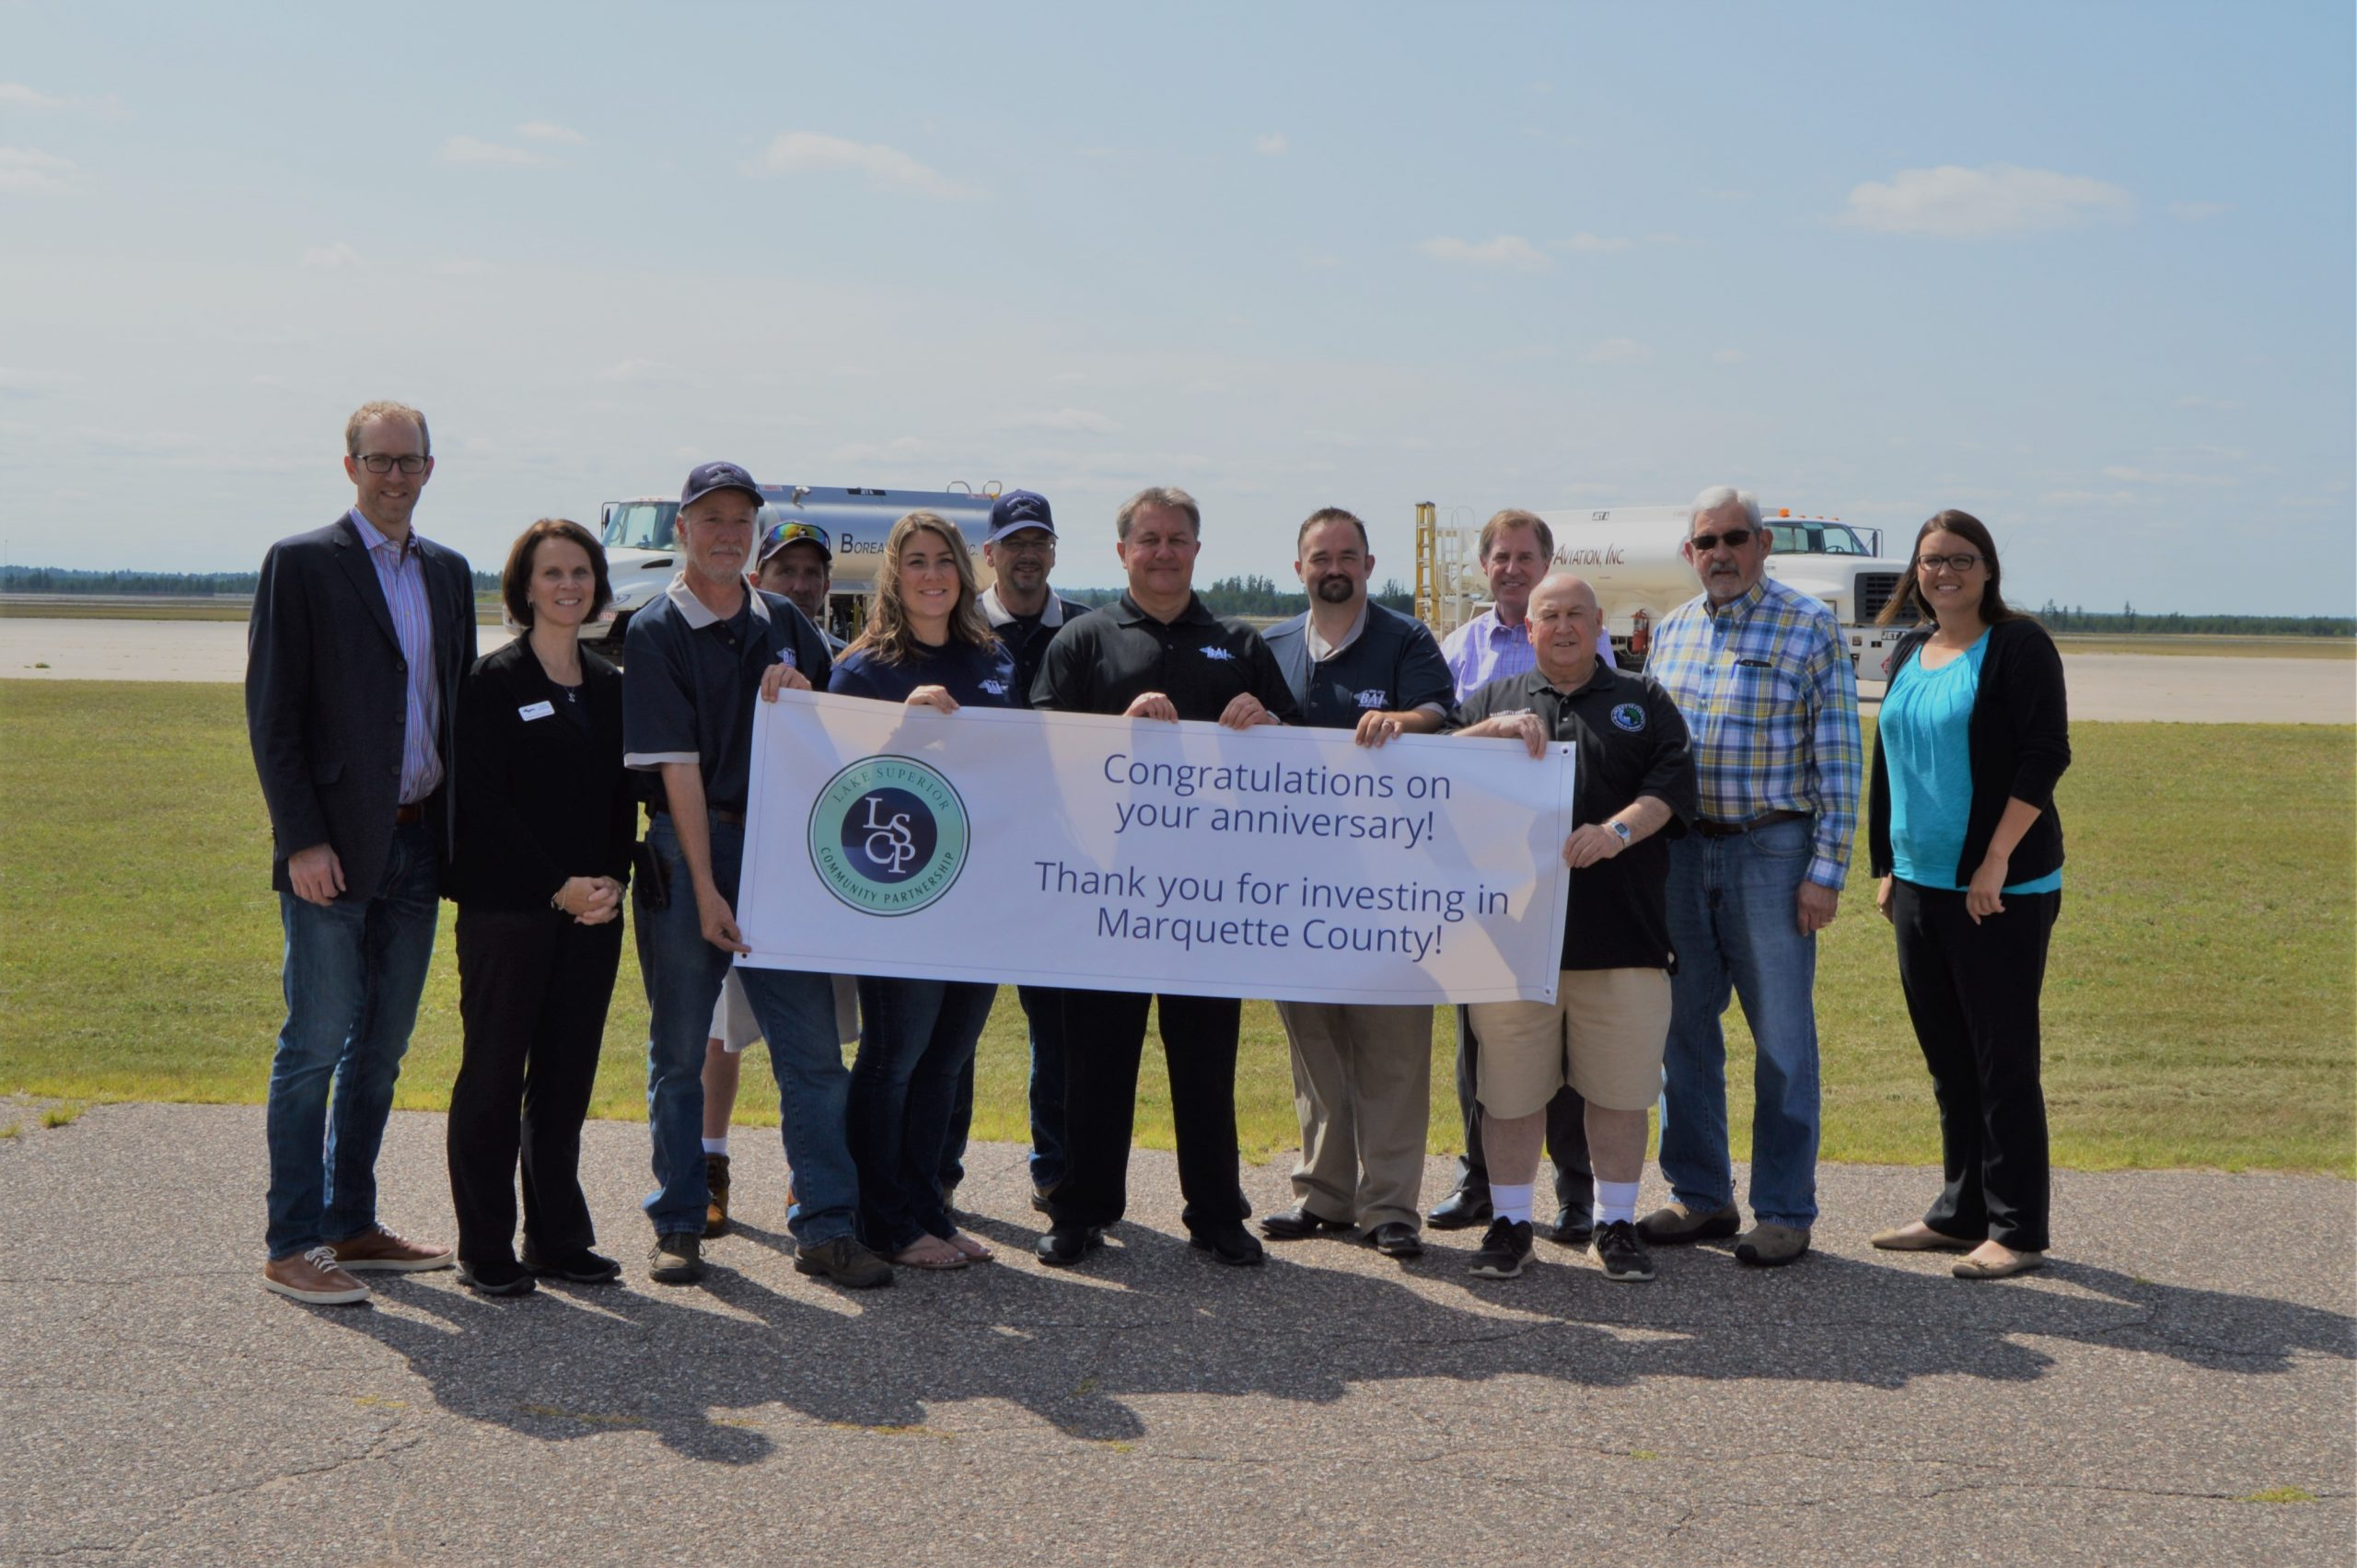 Boreal Aviation Celebrates Its 20th Anniversary